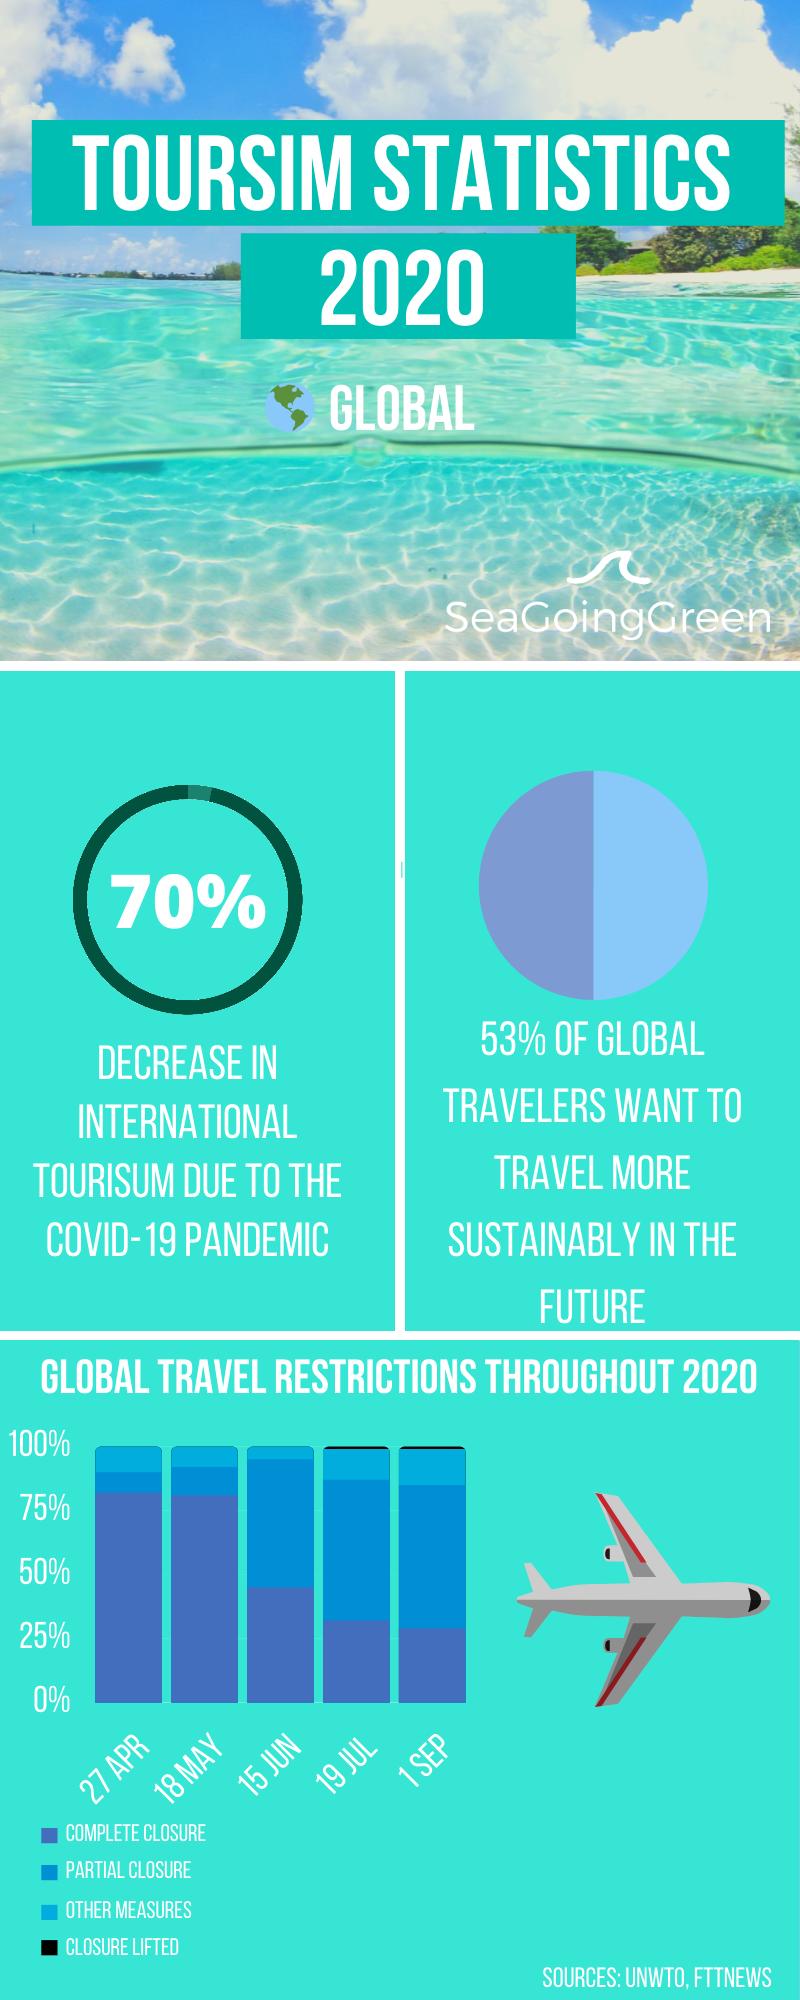 tourismstats2020.png